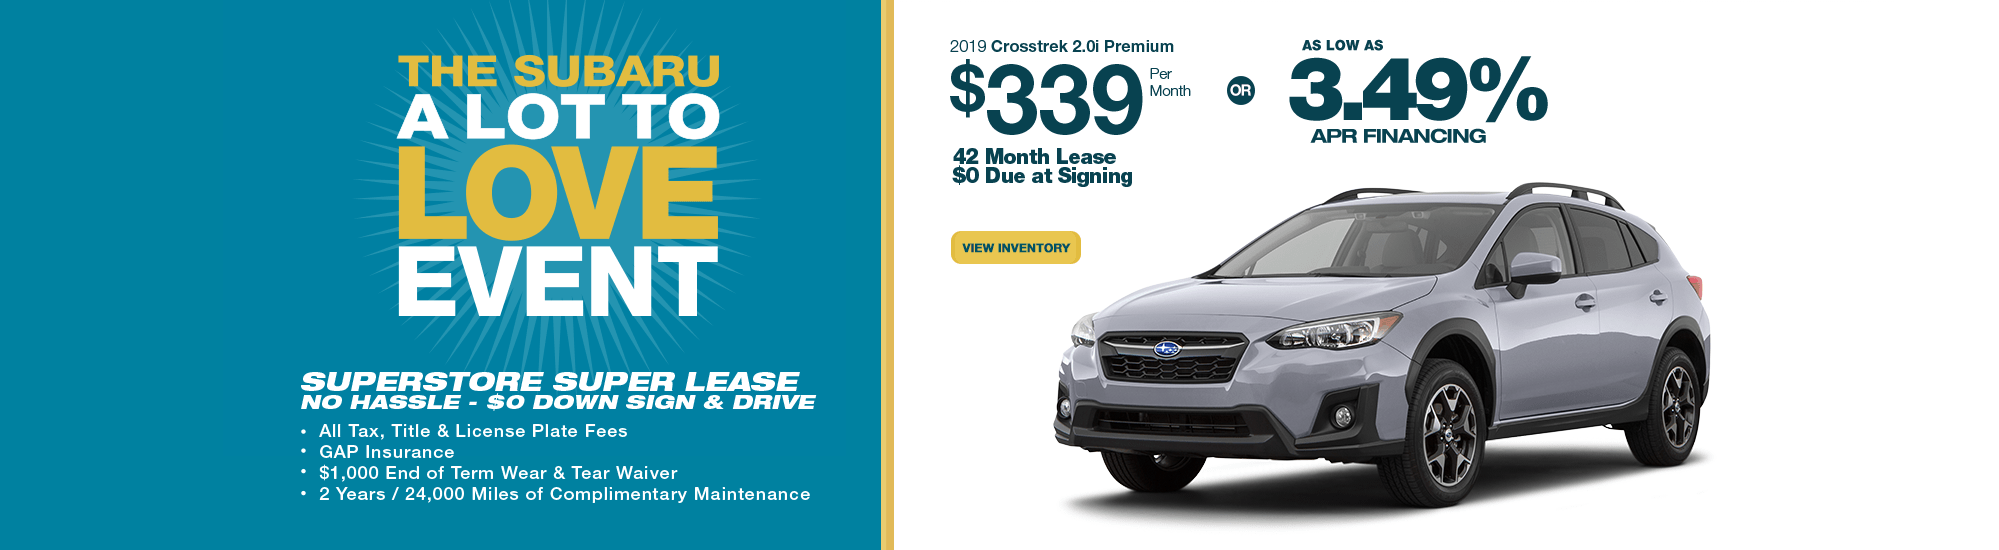 2019 Crosstrek Premium lease or finance special at Subaru Superstore of Chandler